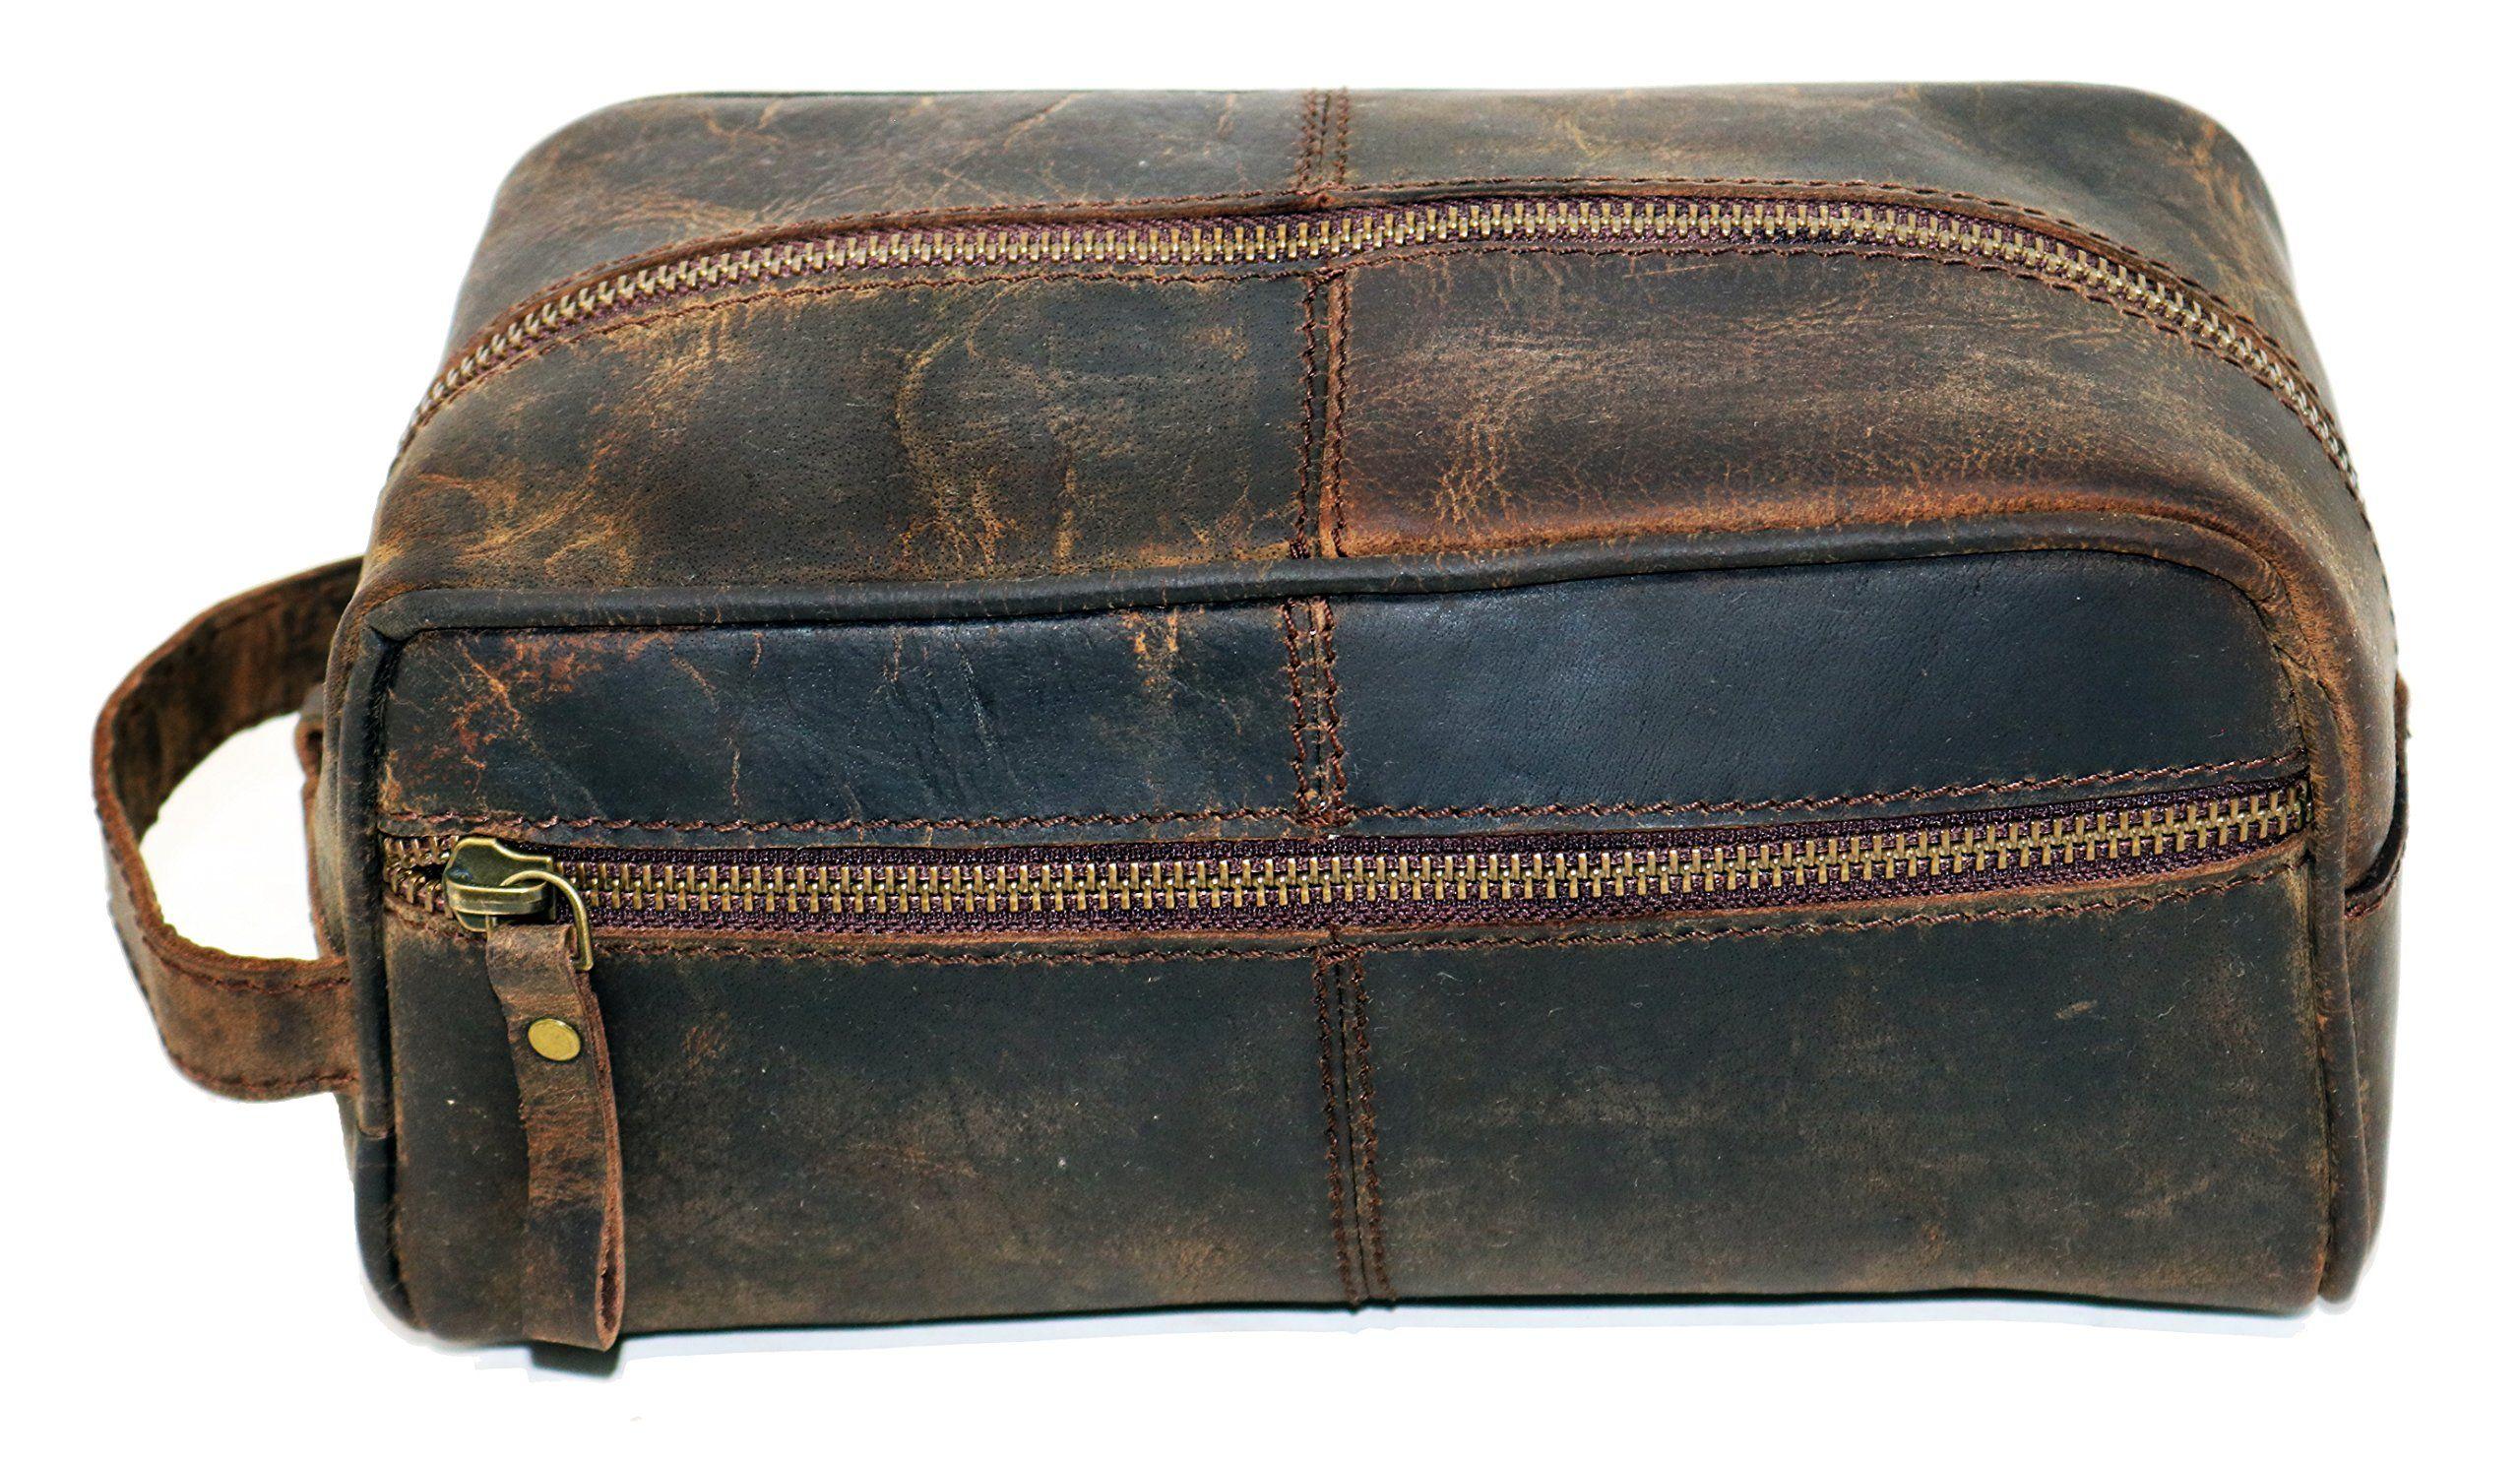 b97fdd529ef6 Cuero Shop Genuine Leather Toiletry Bag Dopp Kit Shaving and ...